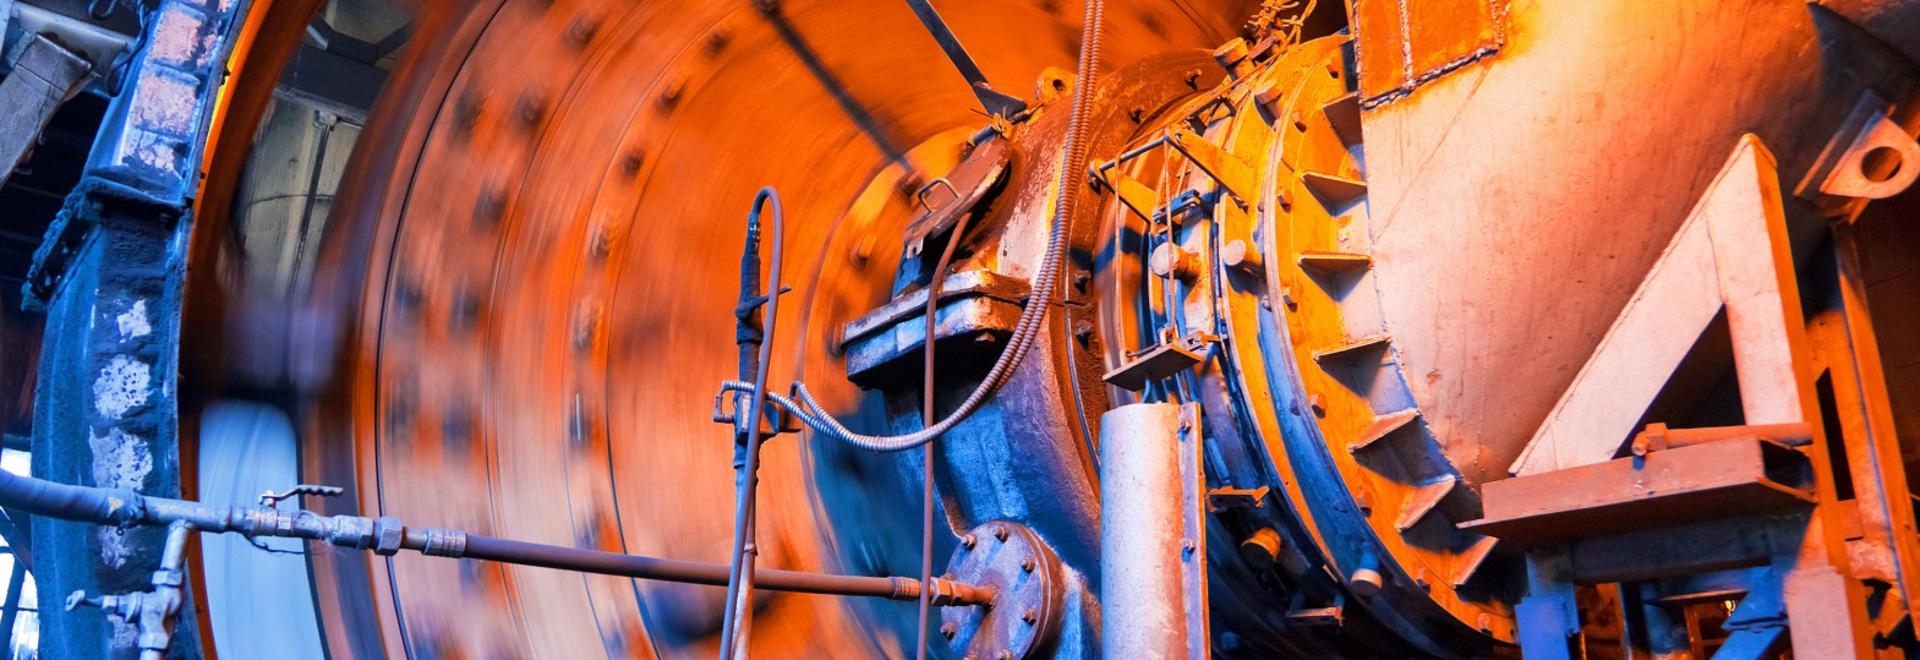 Applicazione del flussometro magnetico in metallurgia